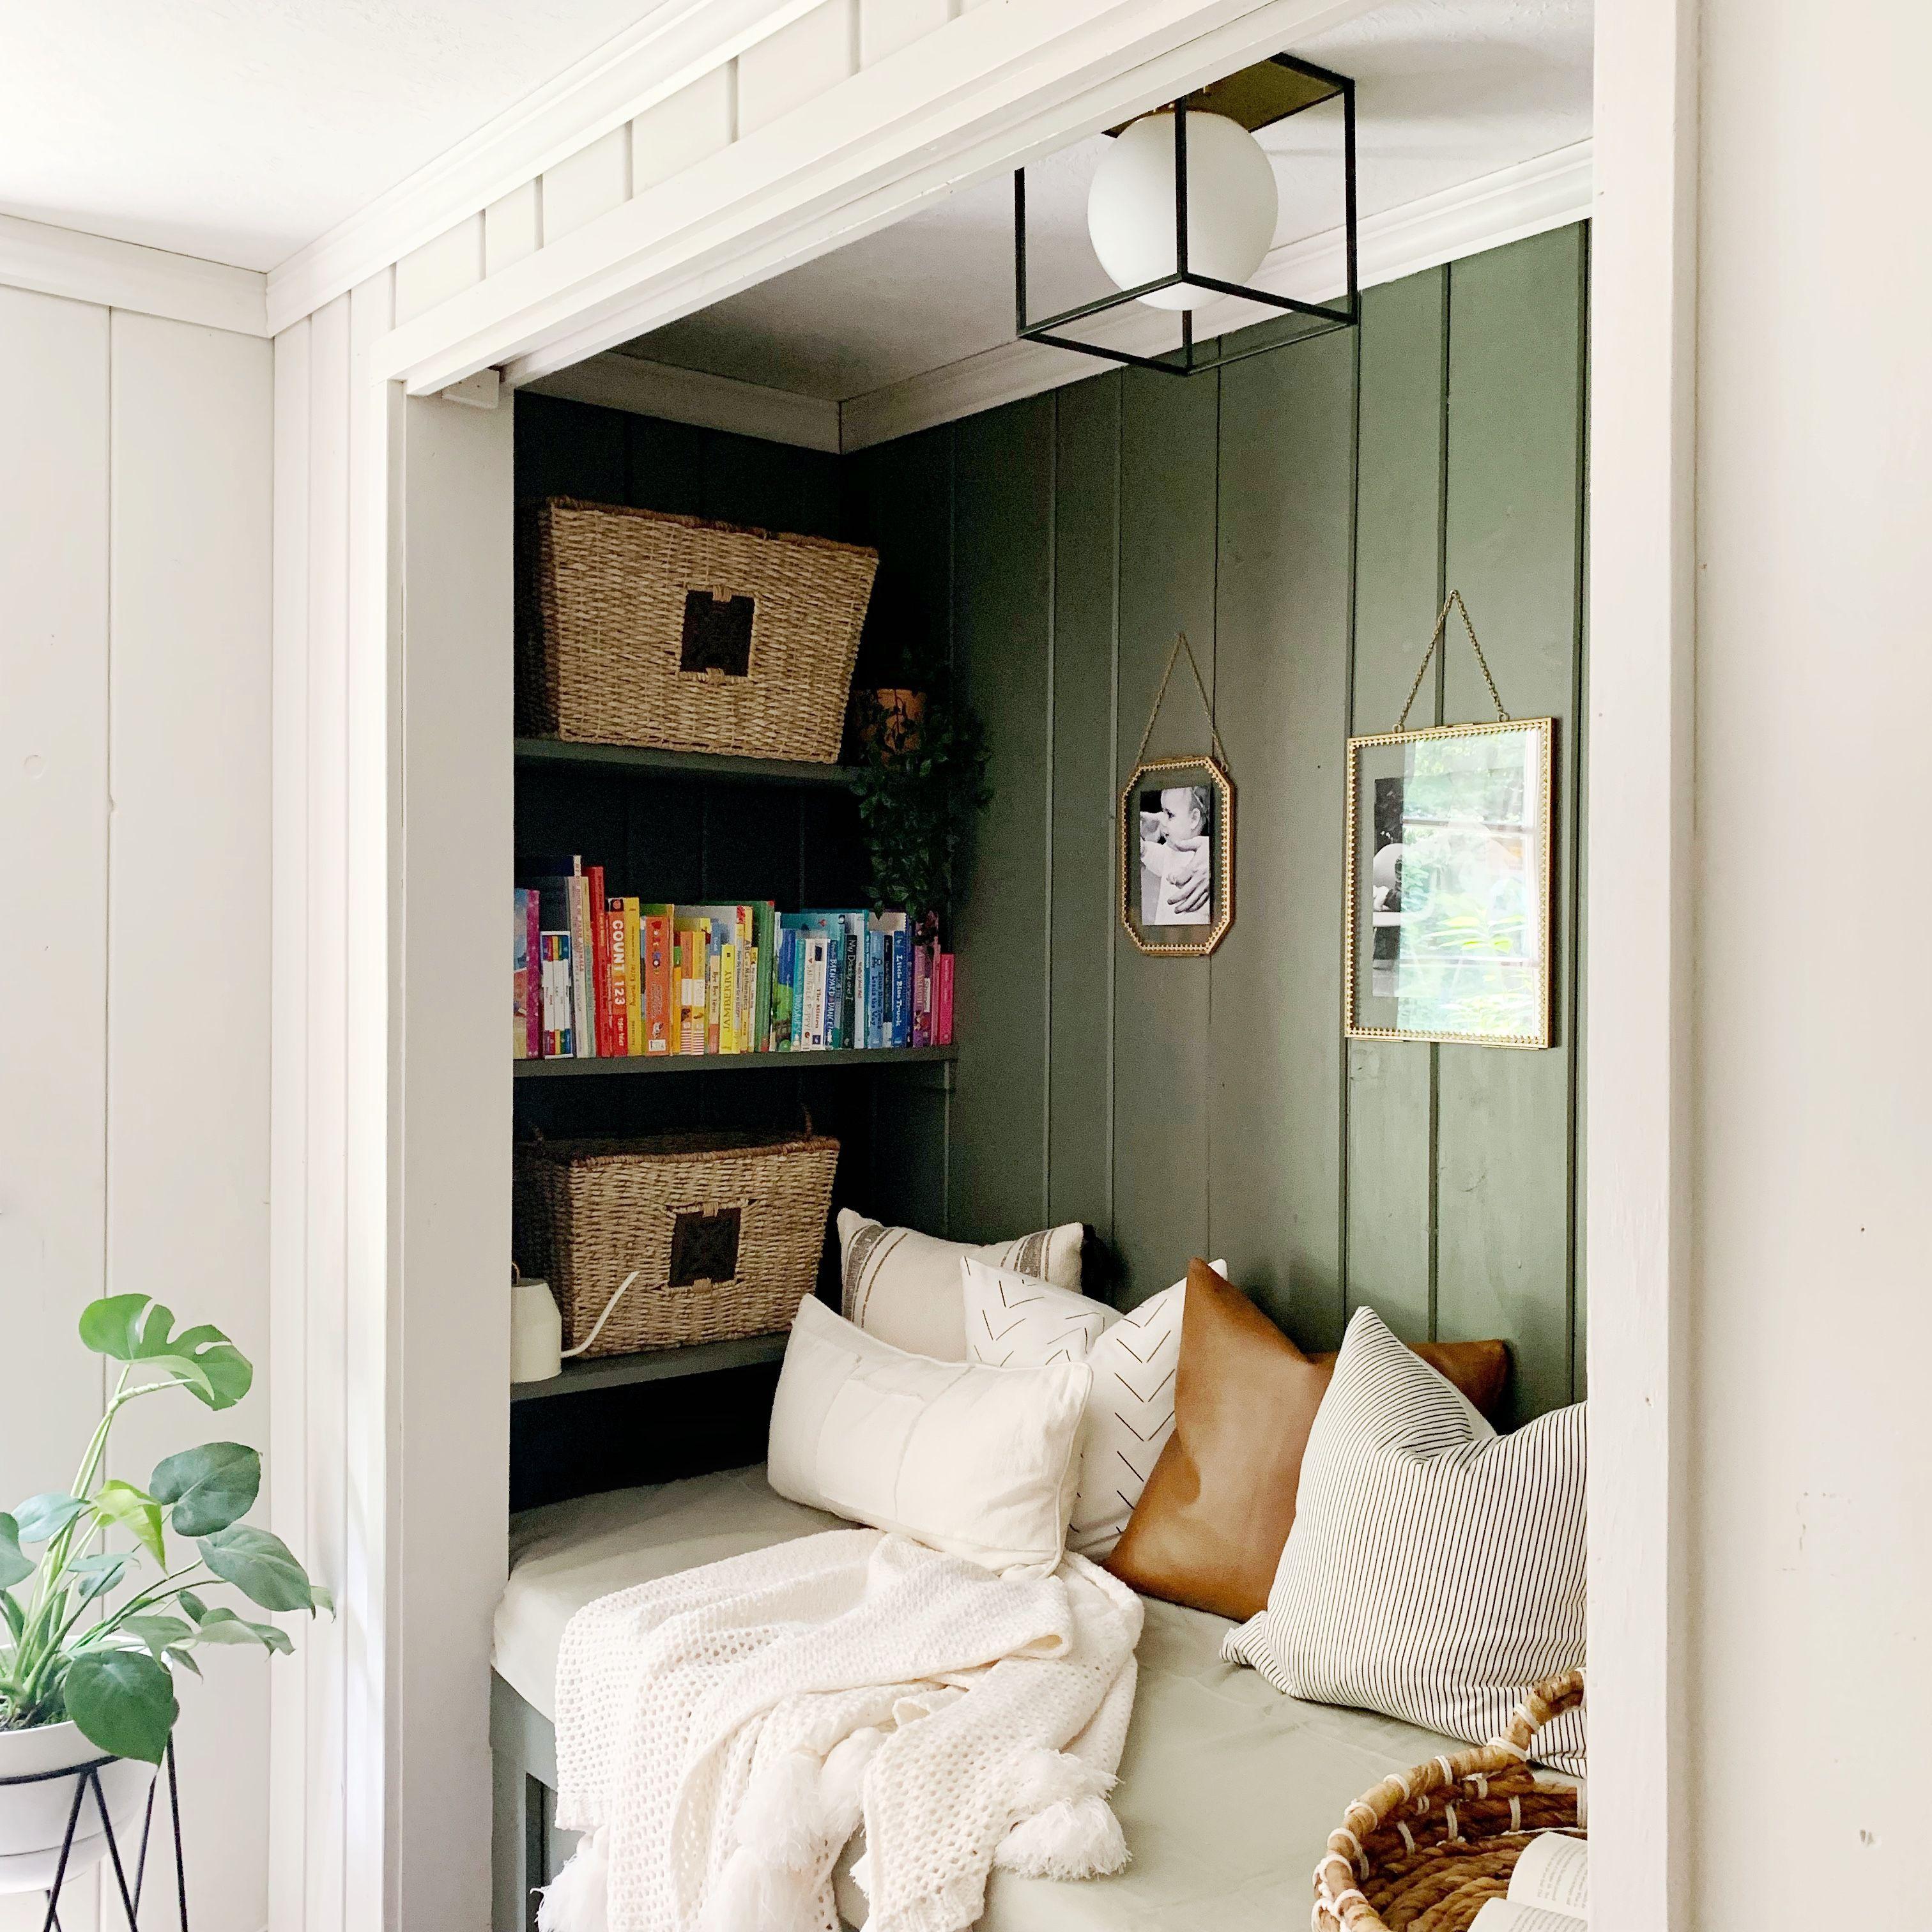 Diy A Cozy Book Nook Style Dwell Cozy Reading Nook Reading Nook Closet Reading Nook